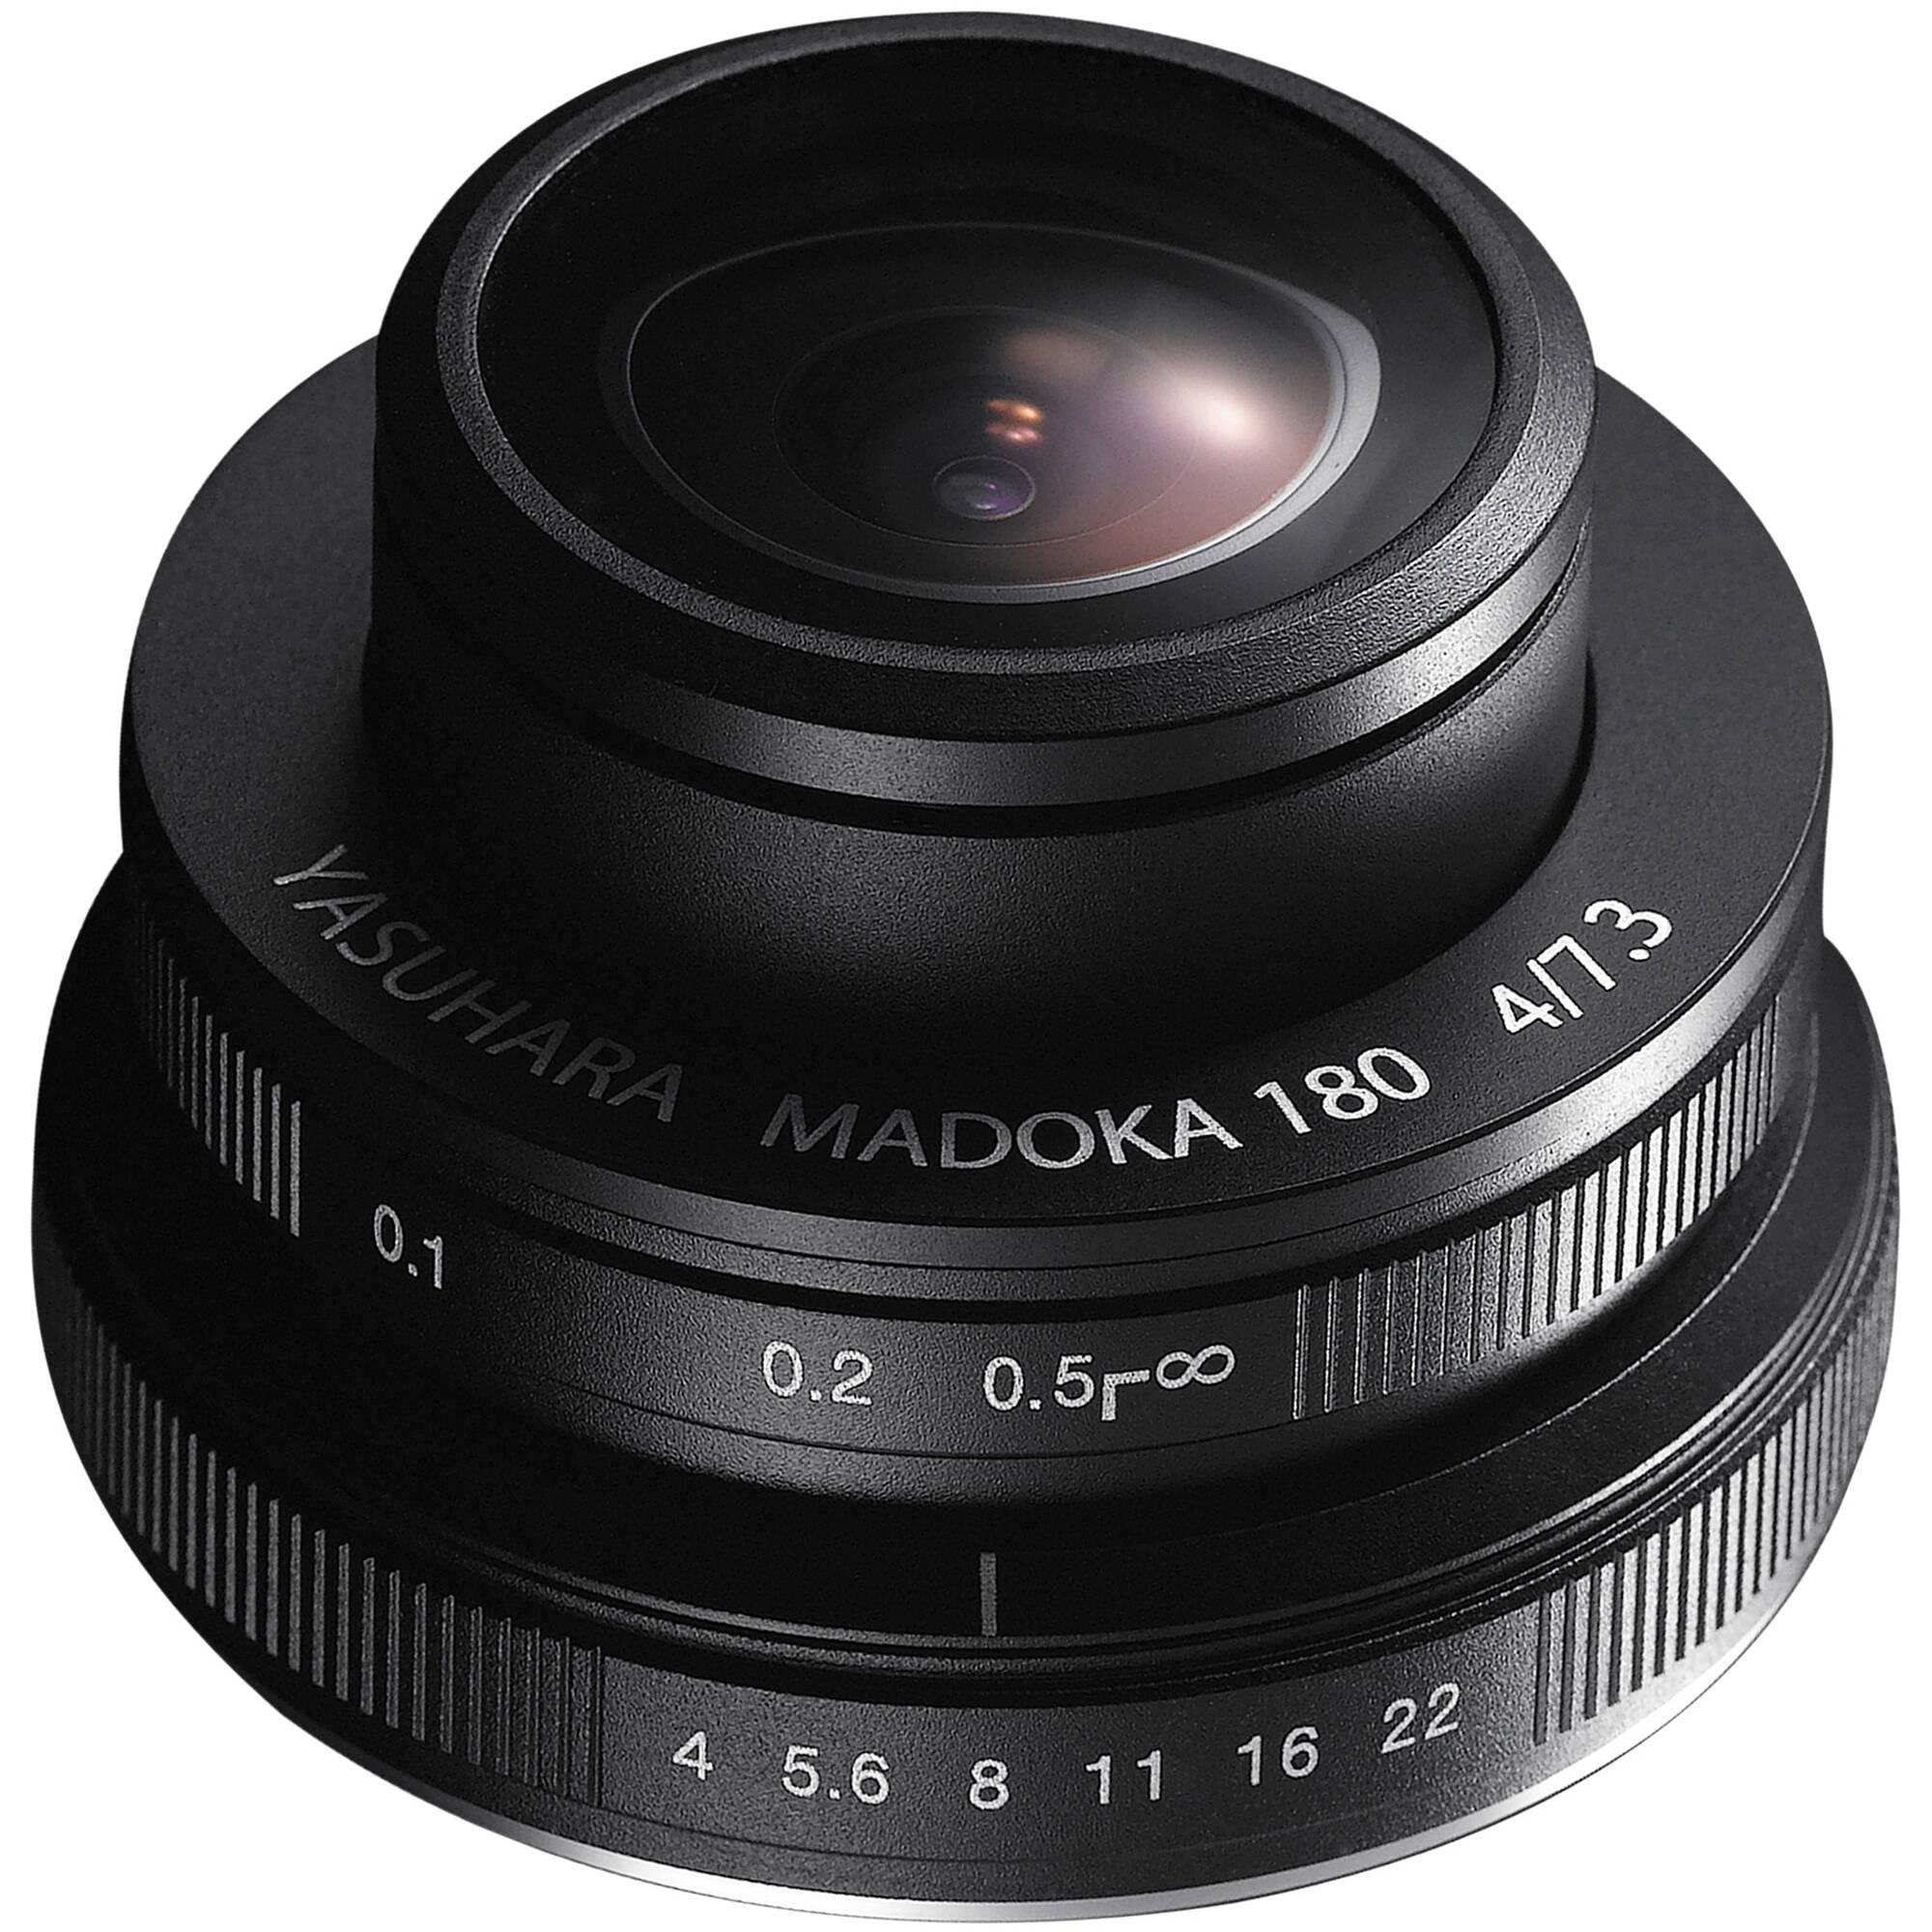 Yasuhara madoka 180 fisheye lens for sony e mount for Fish eye camera